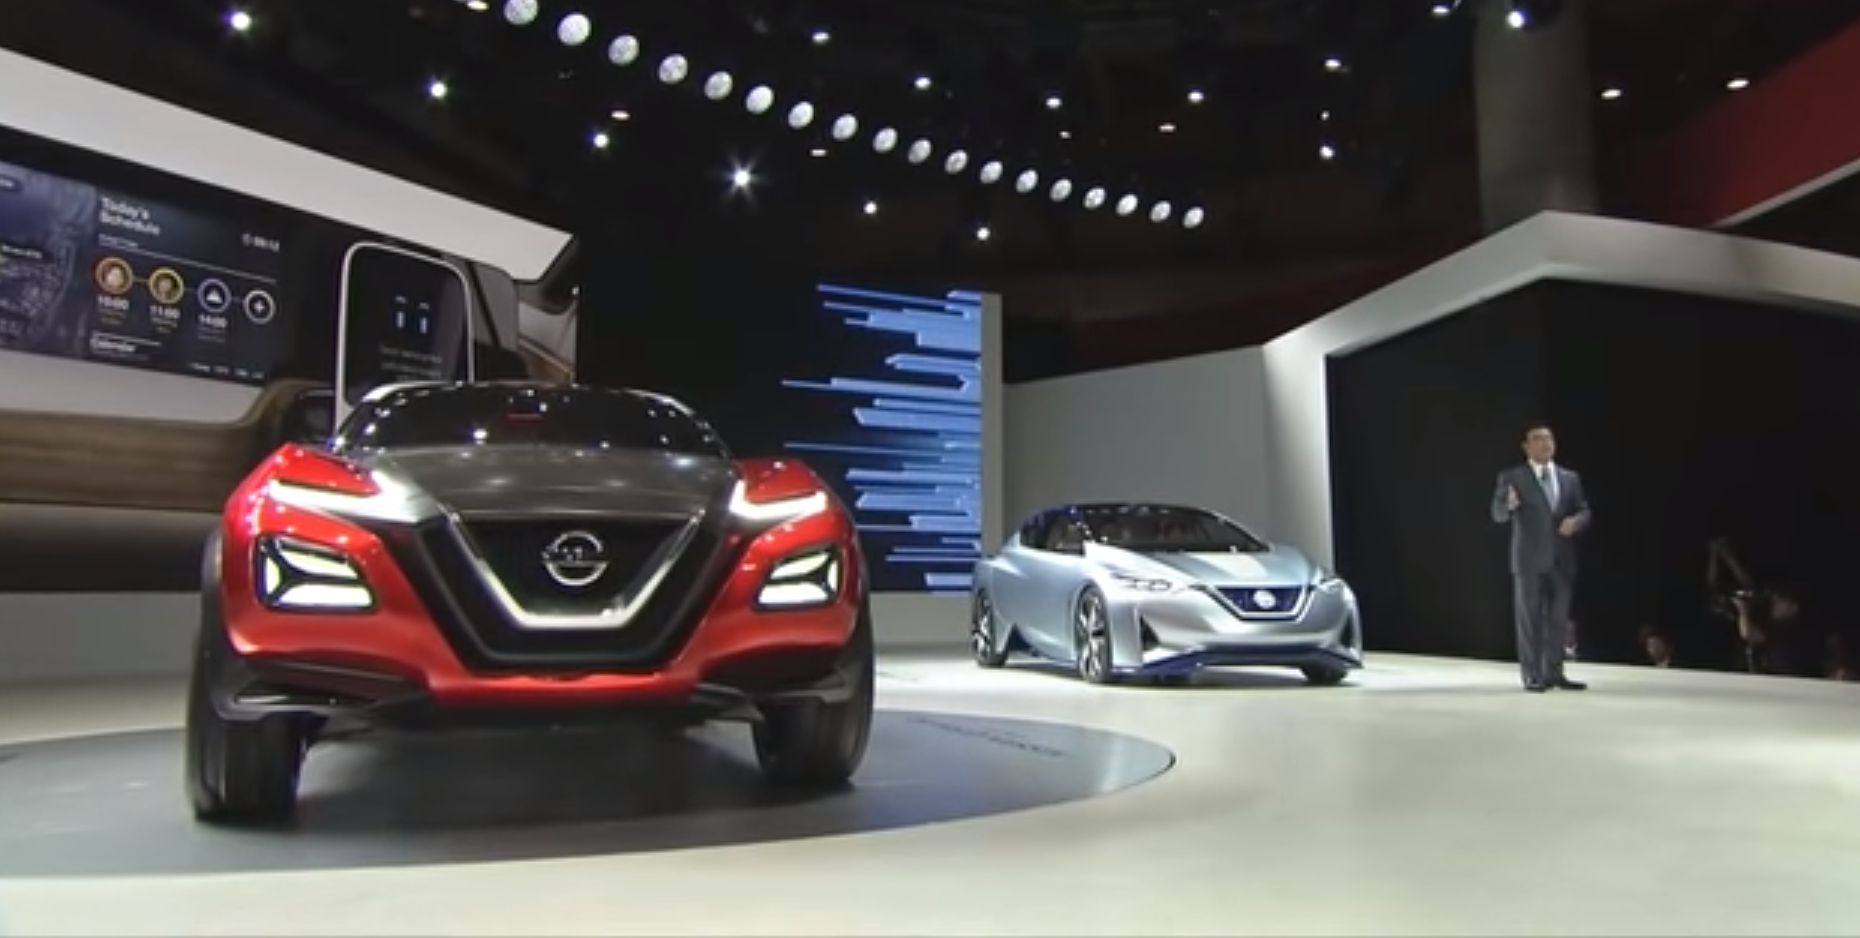 Nissan tokyo presentation